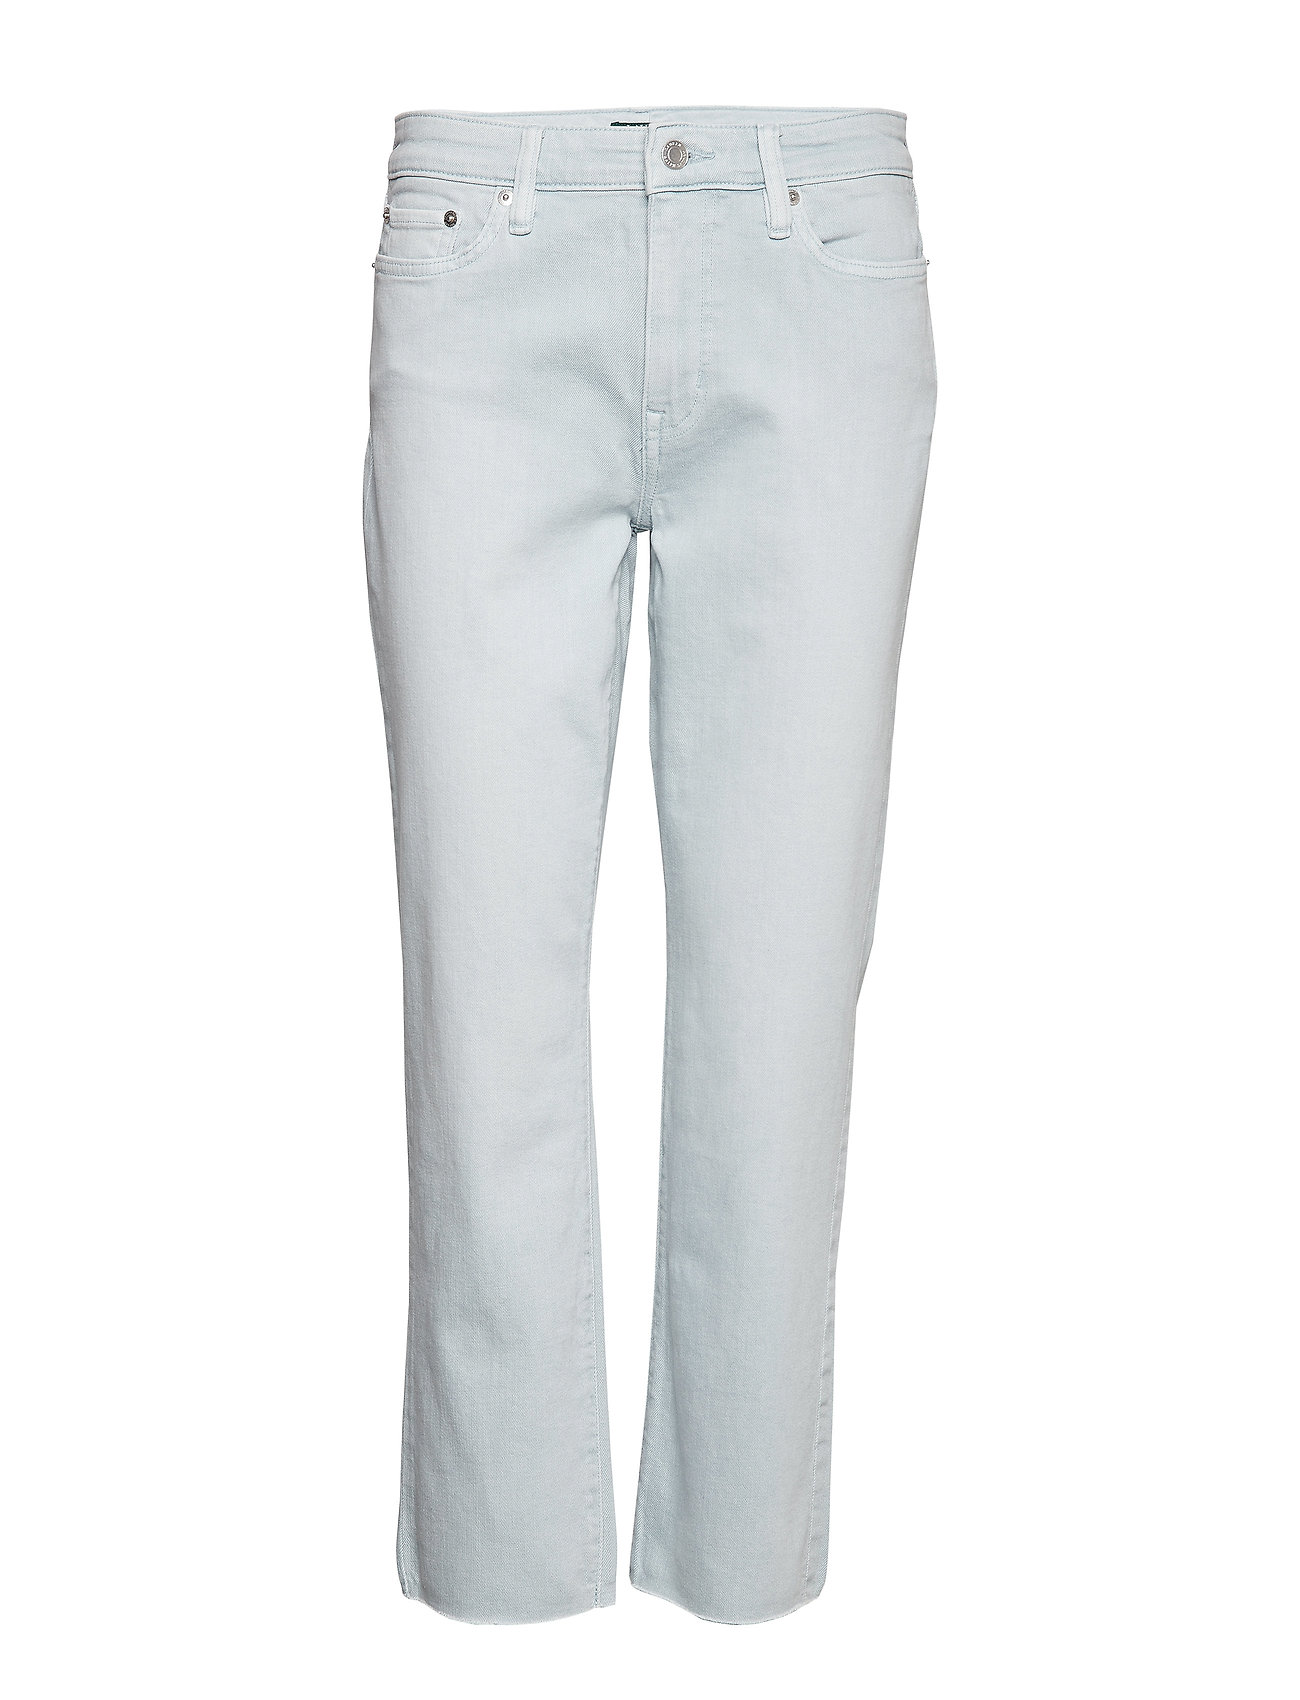 Lauren Ralph Lauren Premier Straight Ankle Jean - ENGLISH BLUE WASH